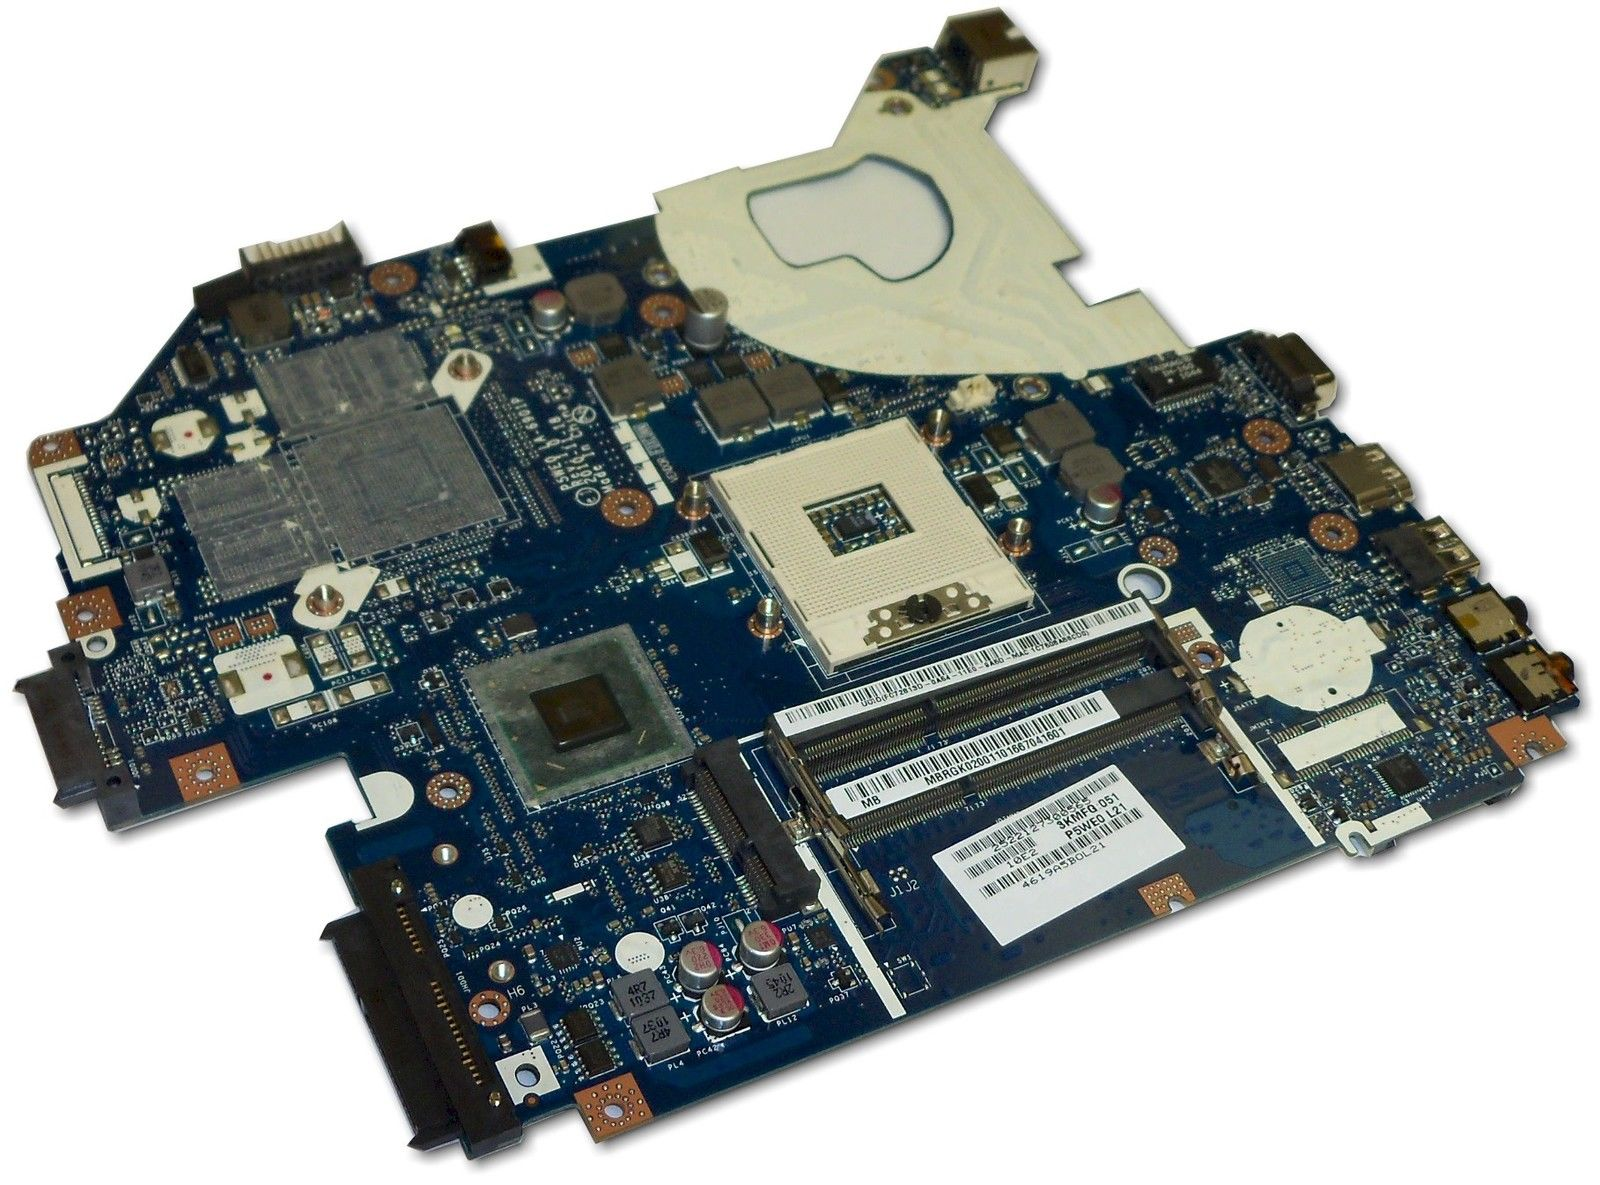 Original Intel Laptop Notebook Motherboard For Acer Aspire